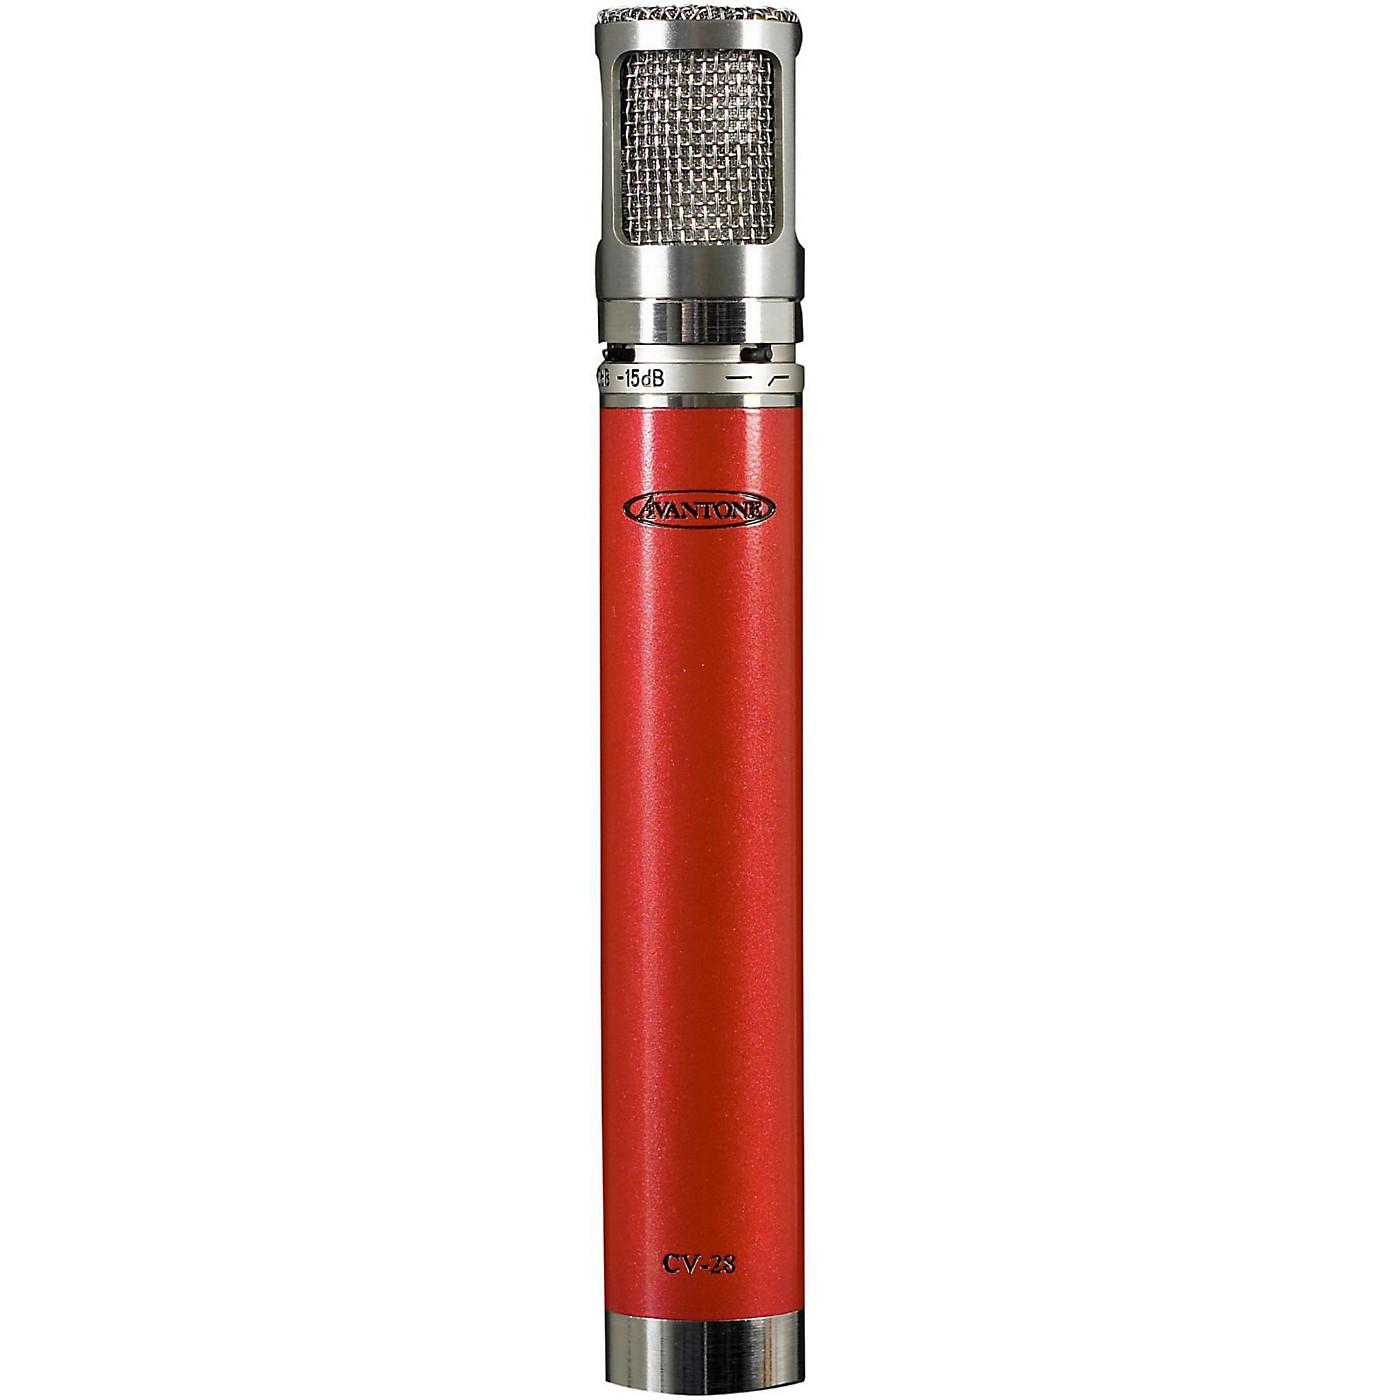 Avantone CV-28 Small-Capsule Tube Condenser Microphone thumbnail